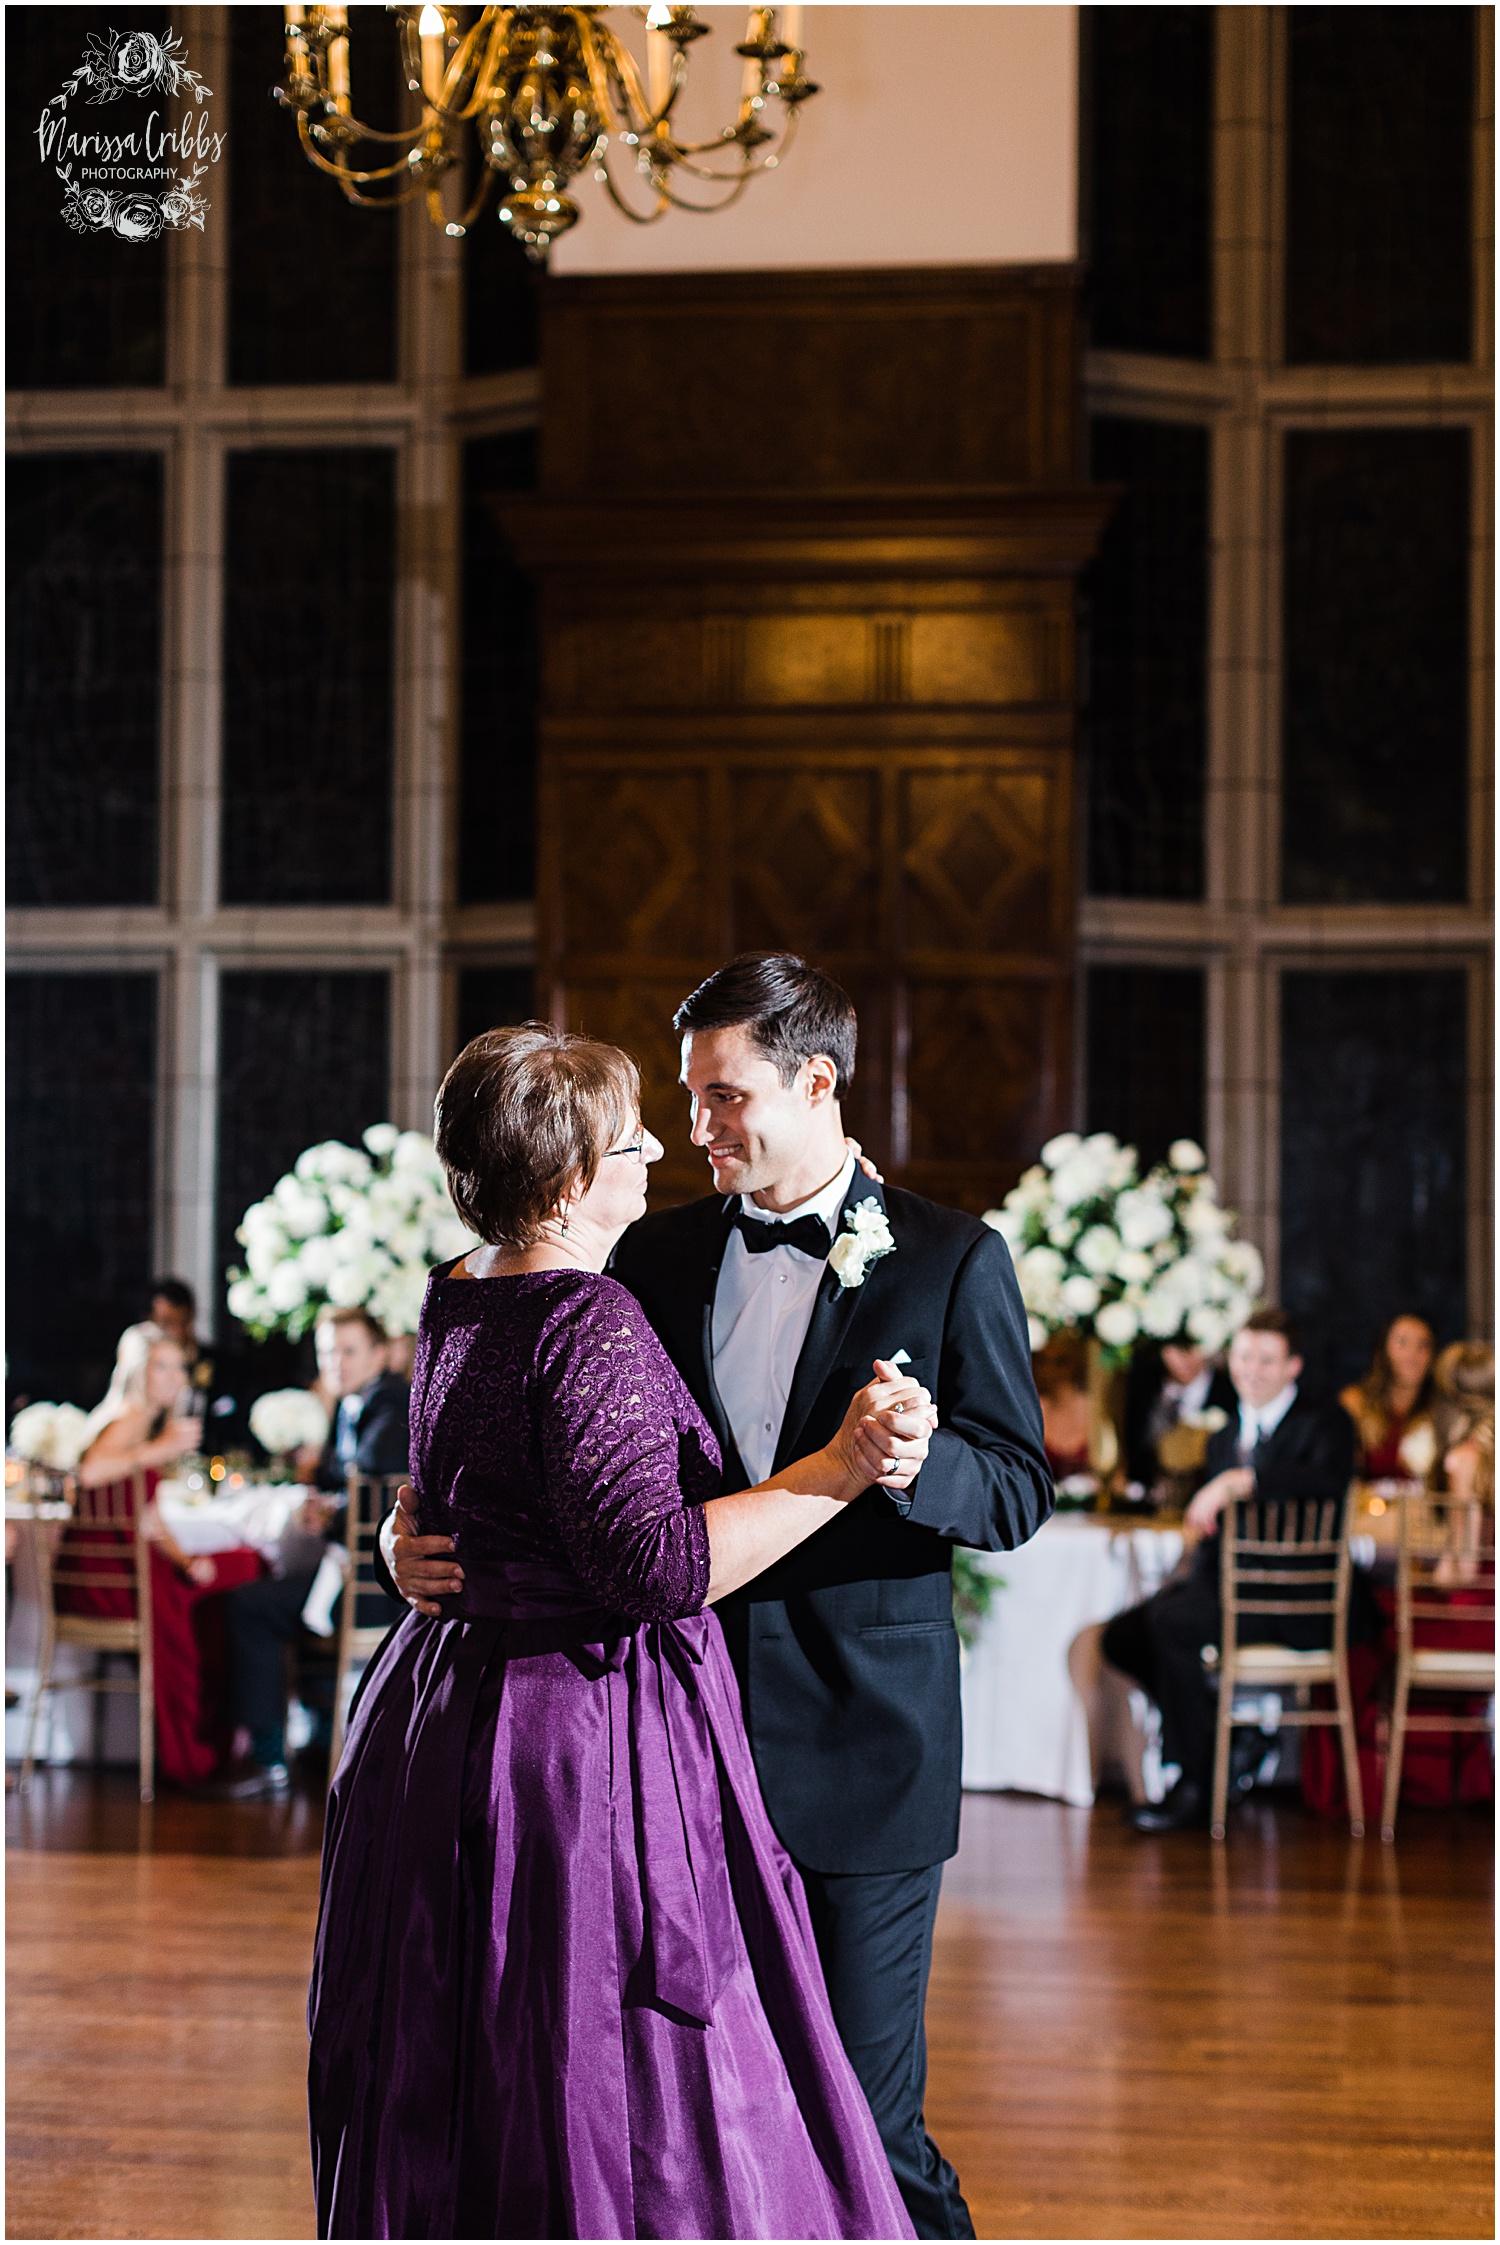 NOLL WEDDING | THE BRASS ON BALTIMORE | MARISSA CRIBBS PHOTOGRAPHY_6384.jpg